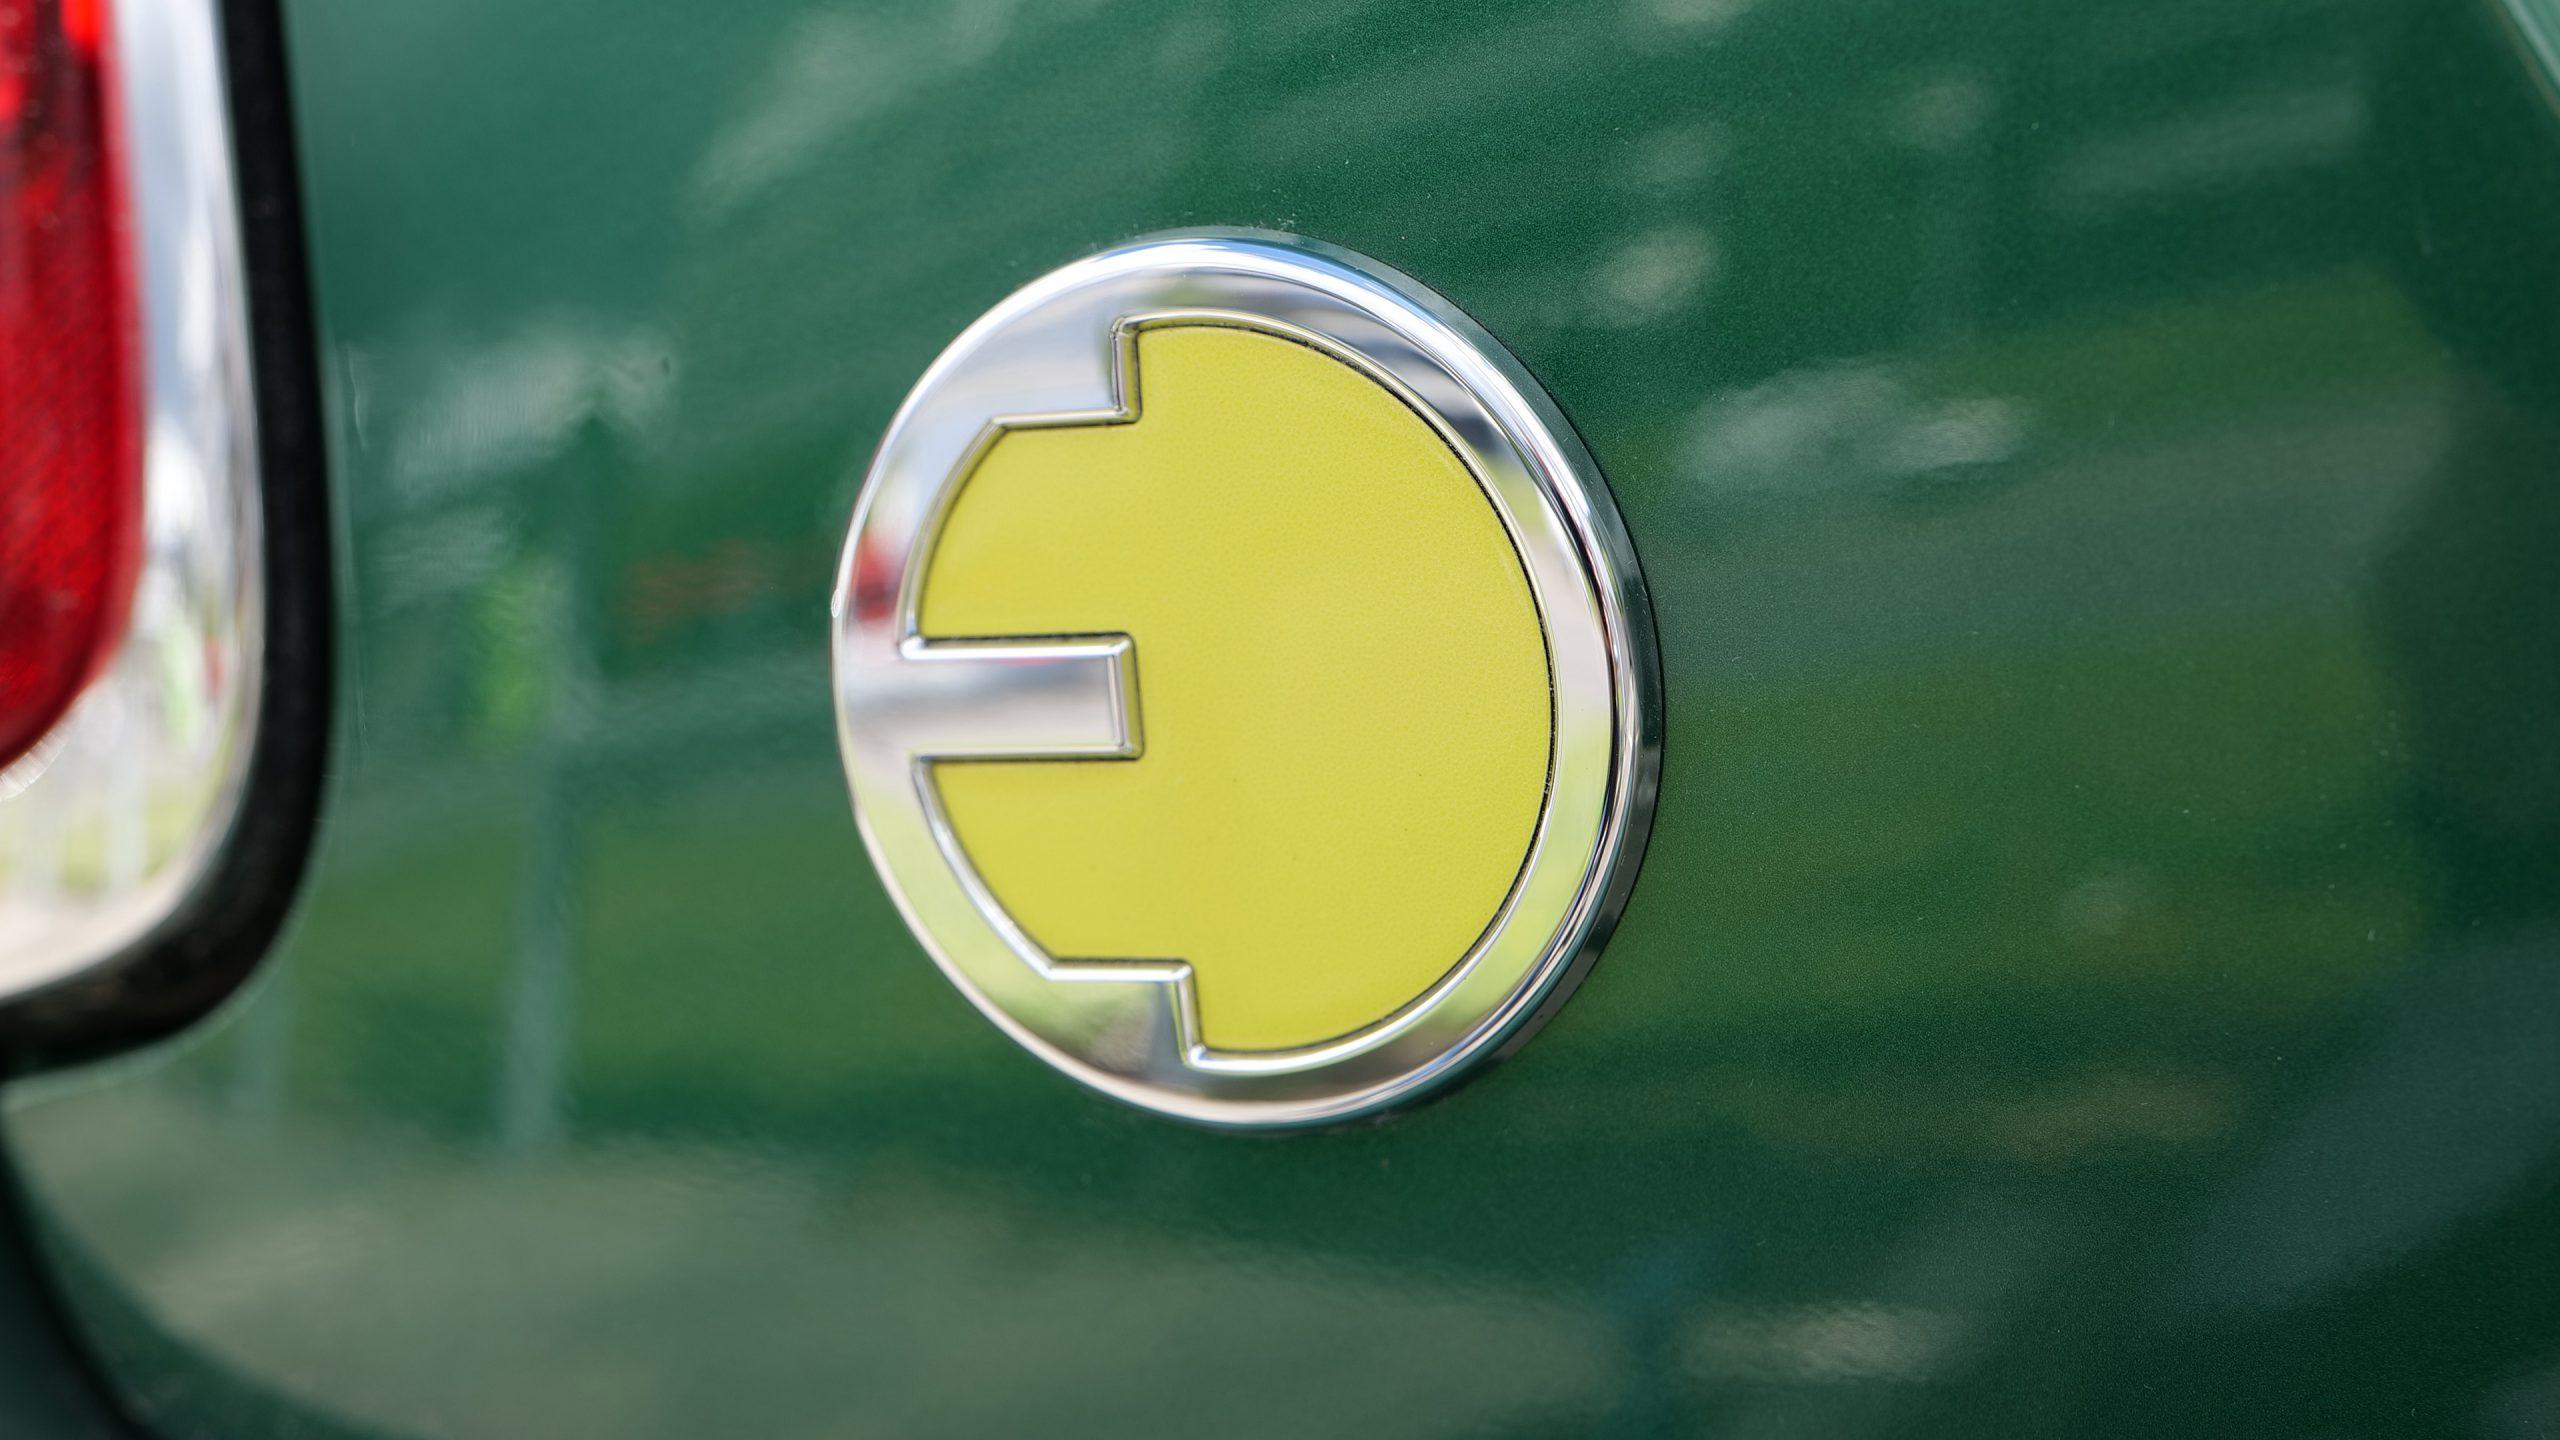 Mini Cooper Electric logo